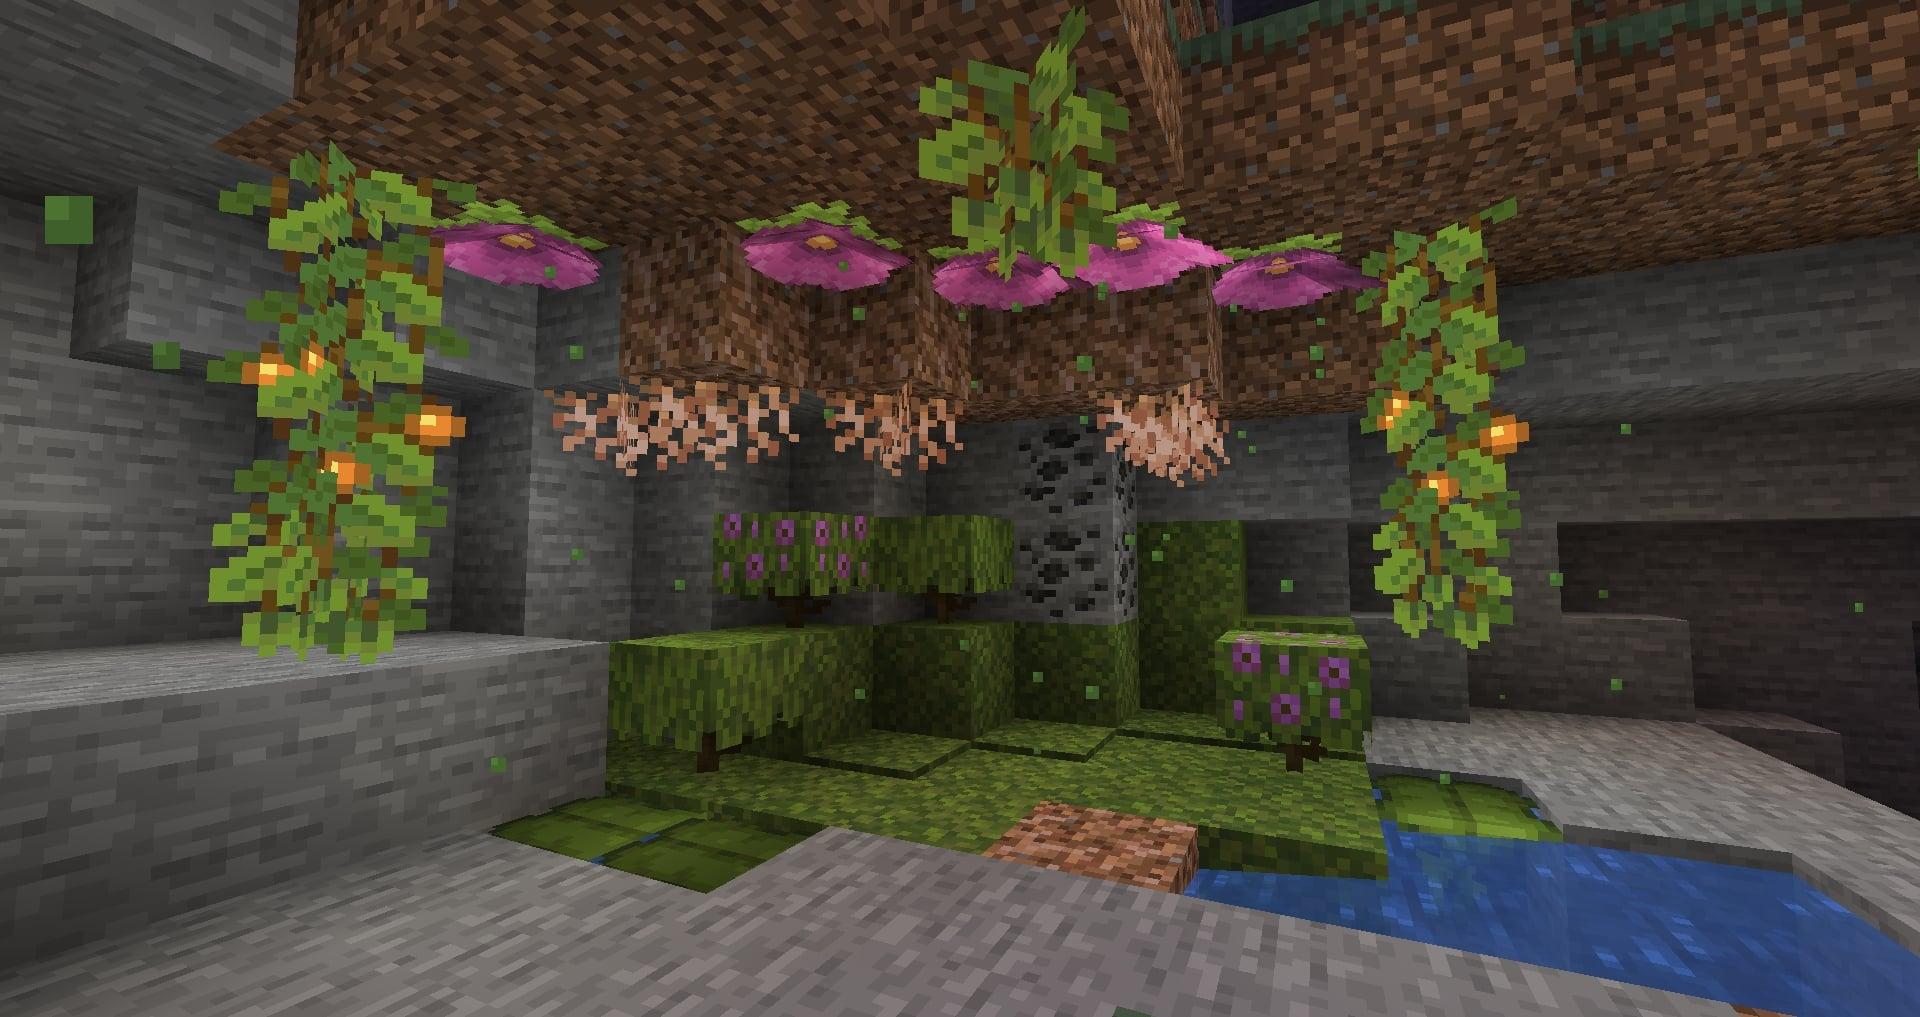 Minecraft 1.17 - Cavernes luxuriantes